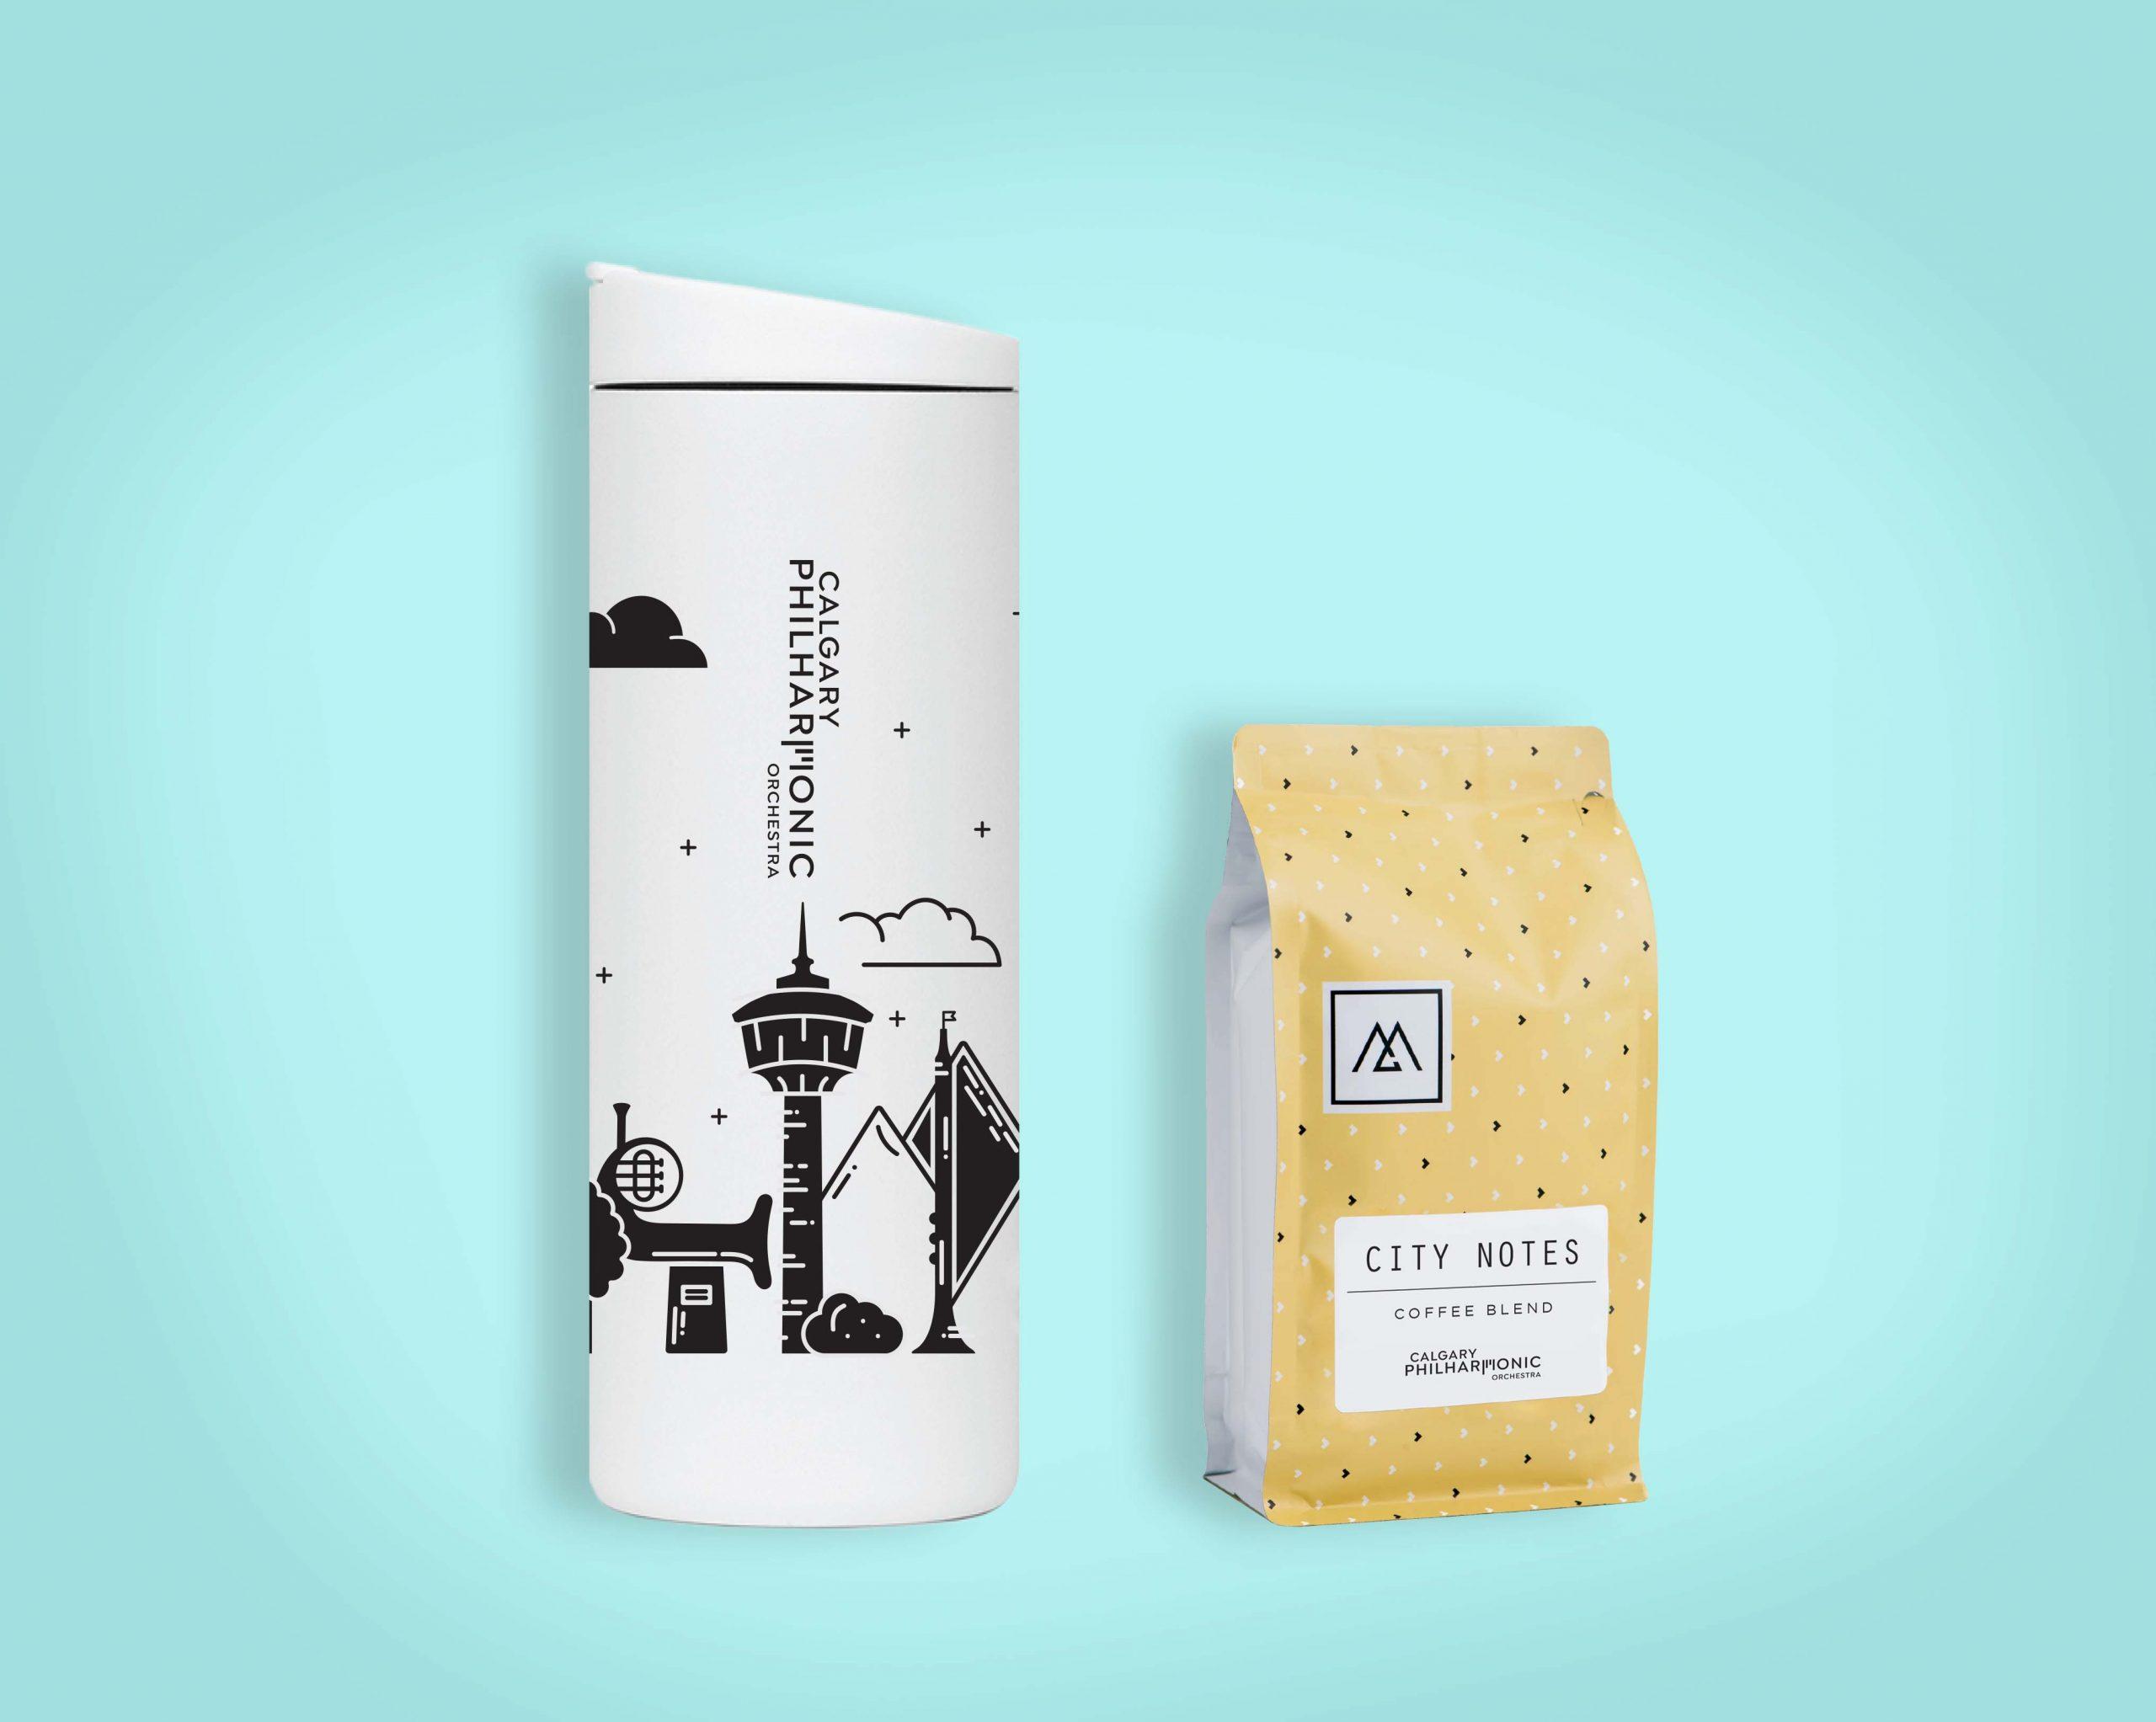 City Notes Tumbler + Coffee   $44